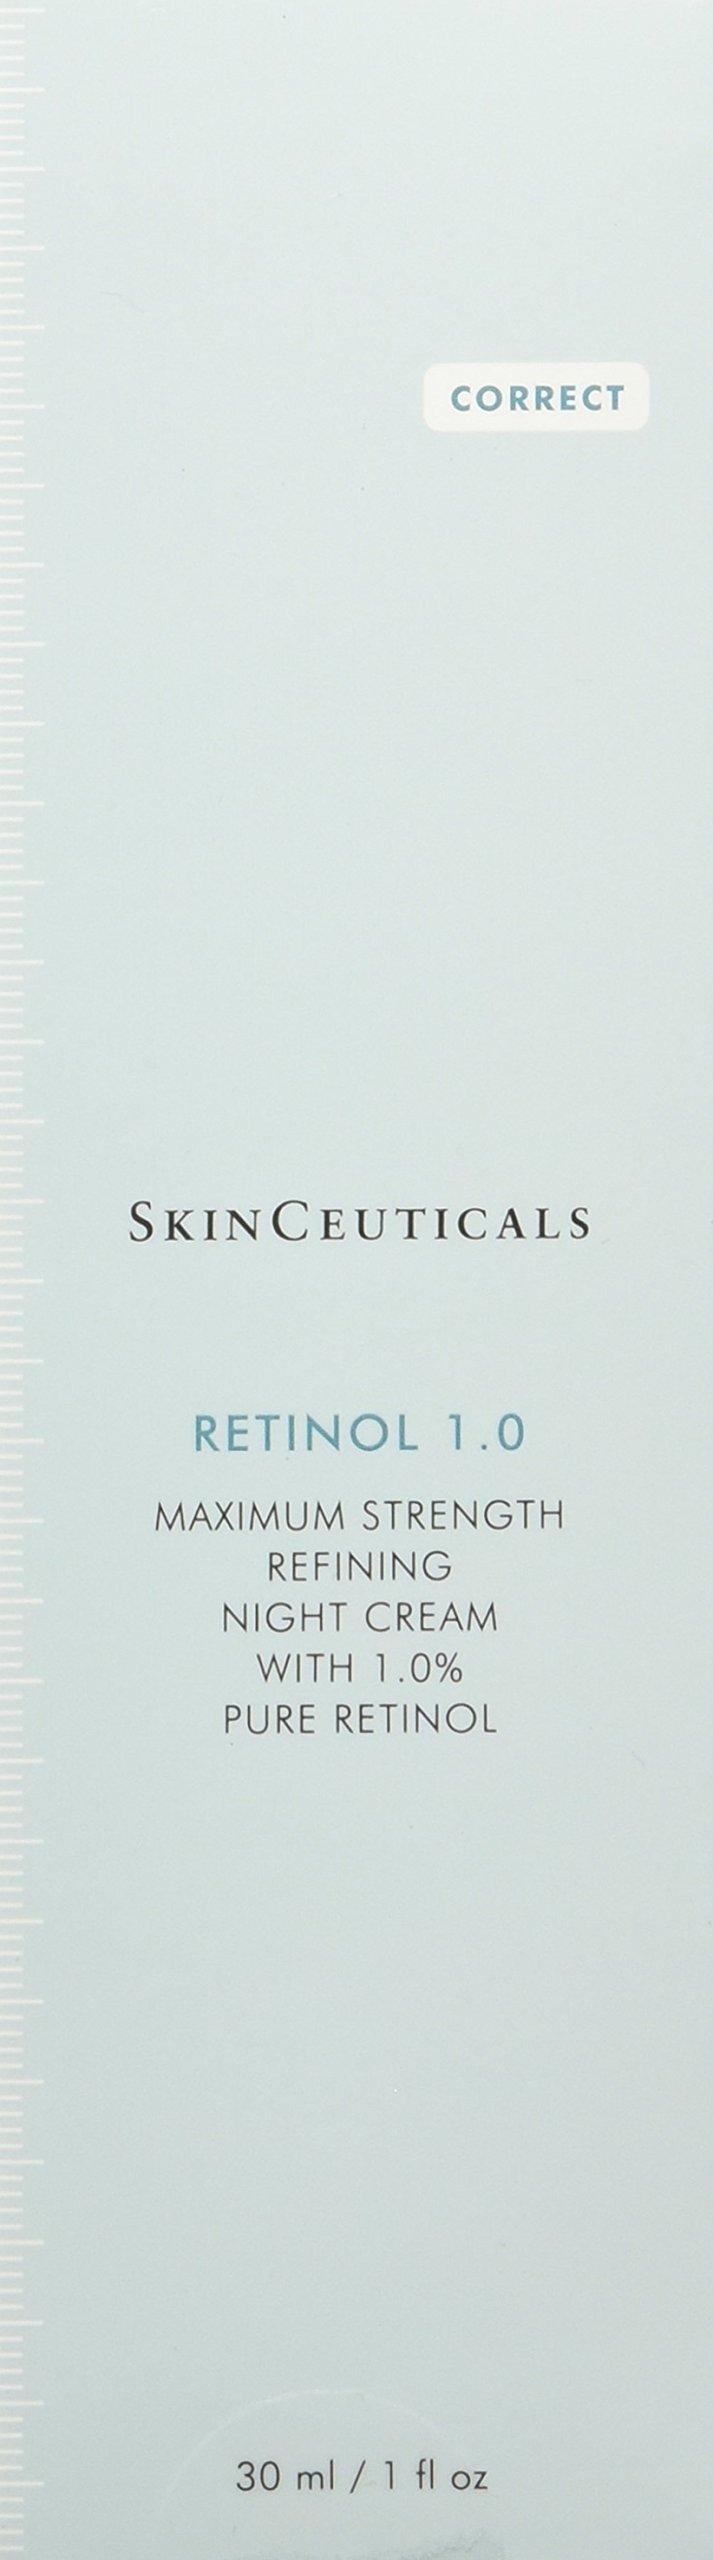 Skinceuticals Retinol 1 Maximum Strength Refining Night Cream, 1 Fluid Ounce by SkinCeuticals (Image #1)